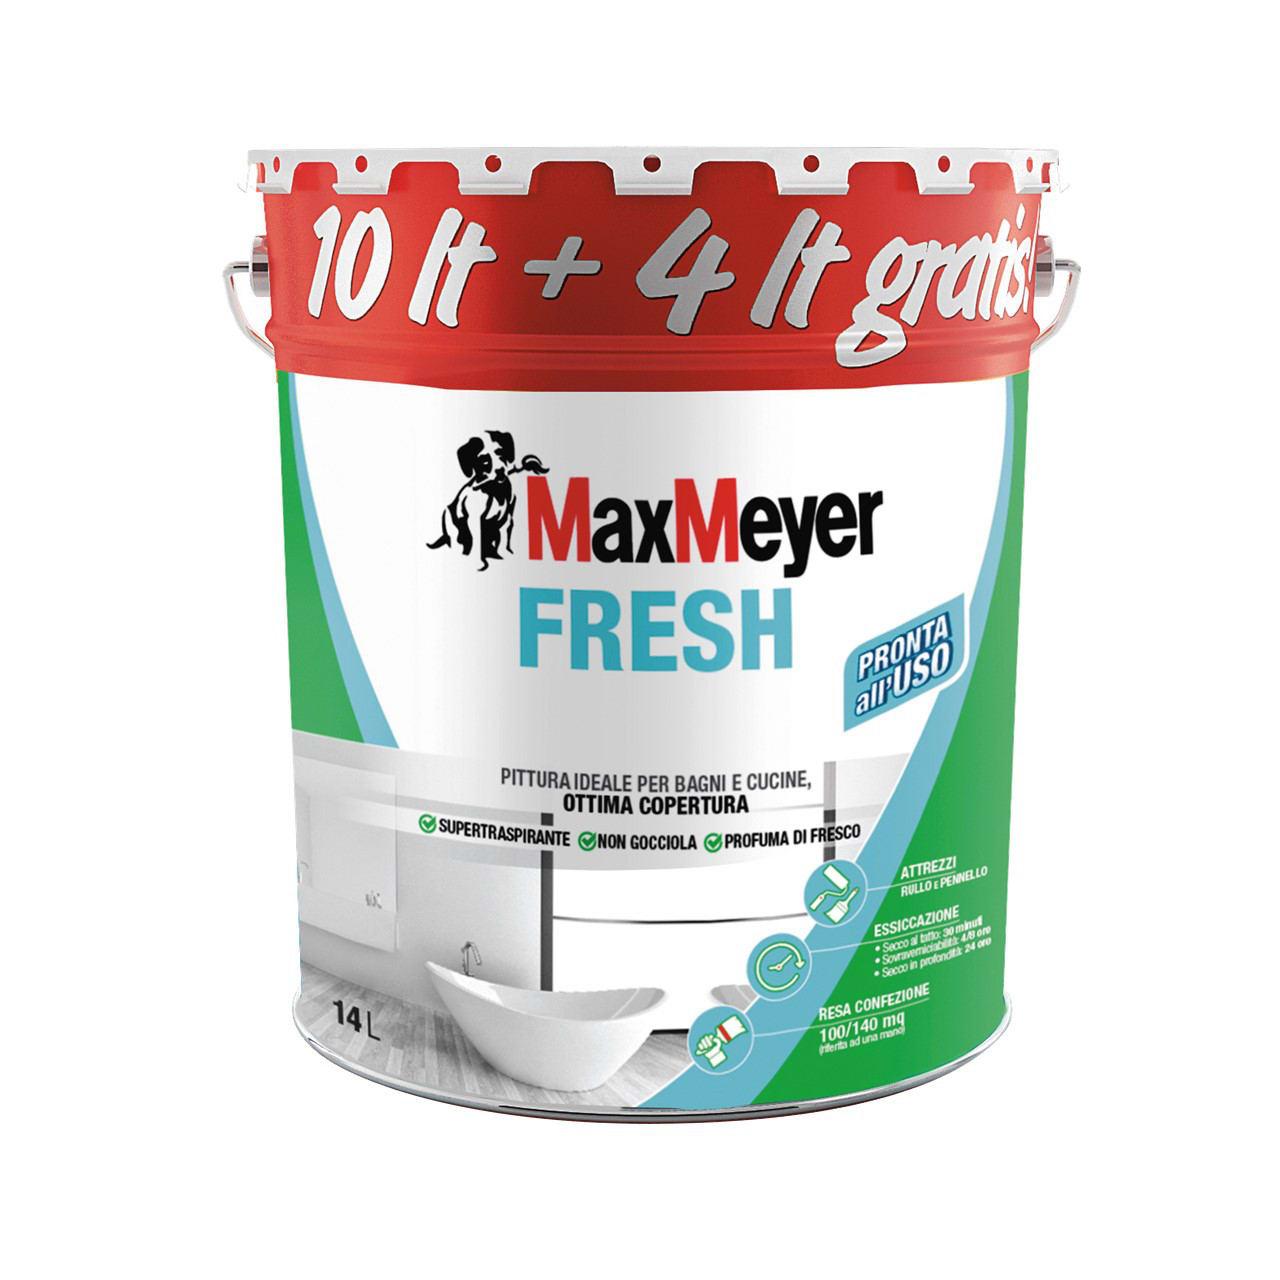 Pittura Murale Fresh Maxmeyer 14 L Bianco Prezzo Online Leroy Merlin